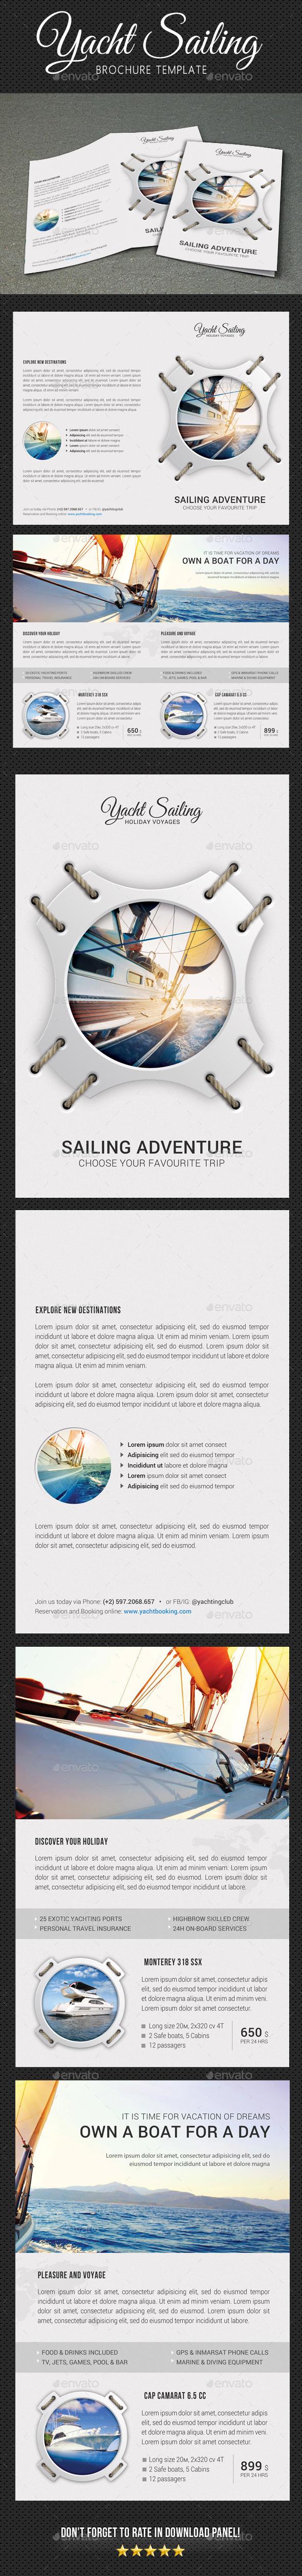 Yachting Brochure 5 - Brochures Print Templates